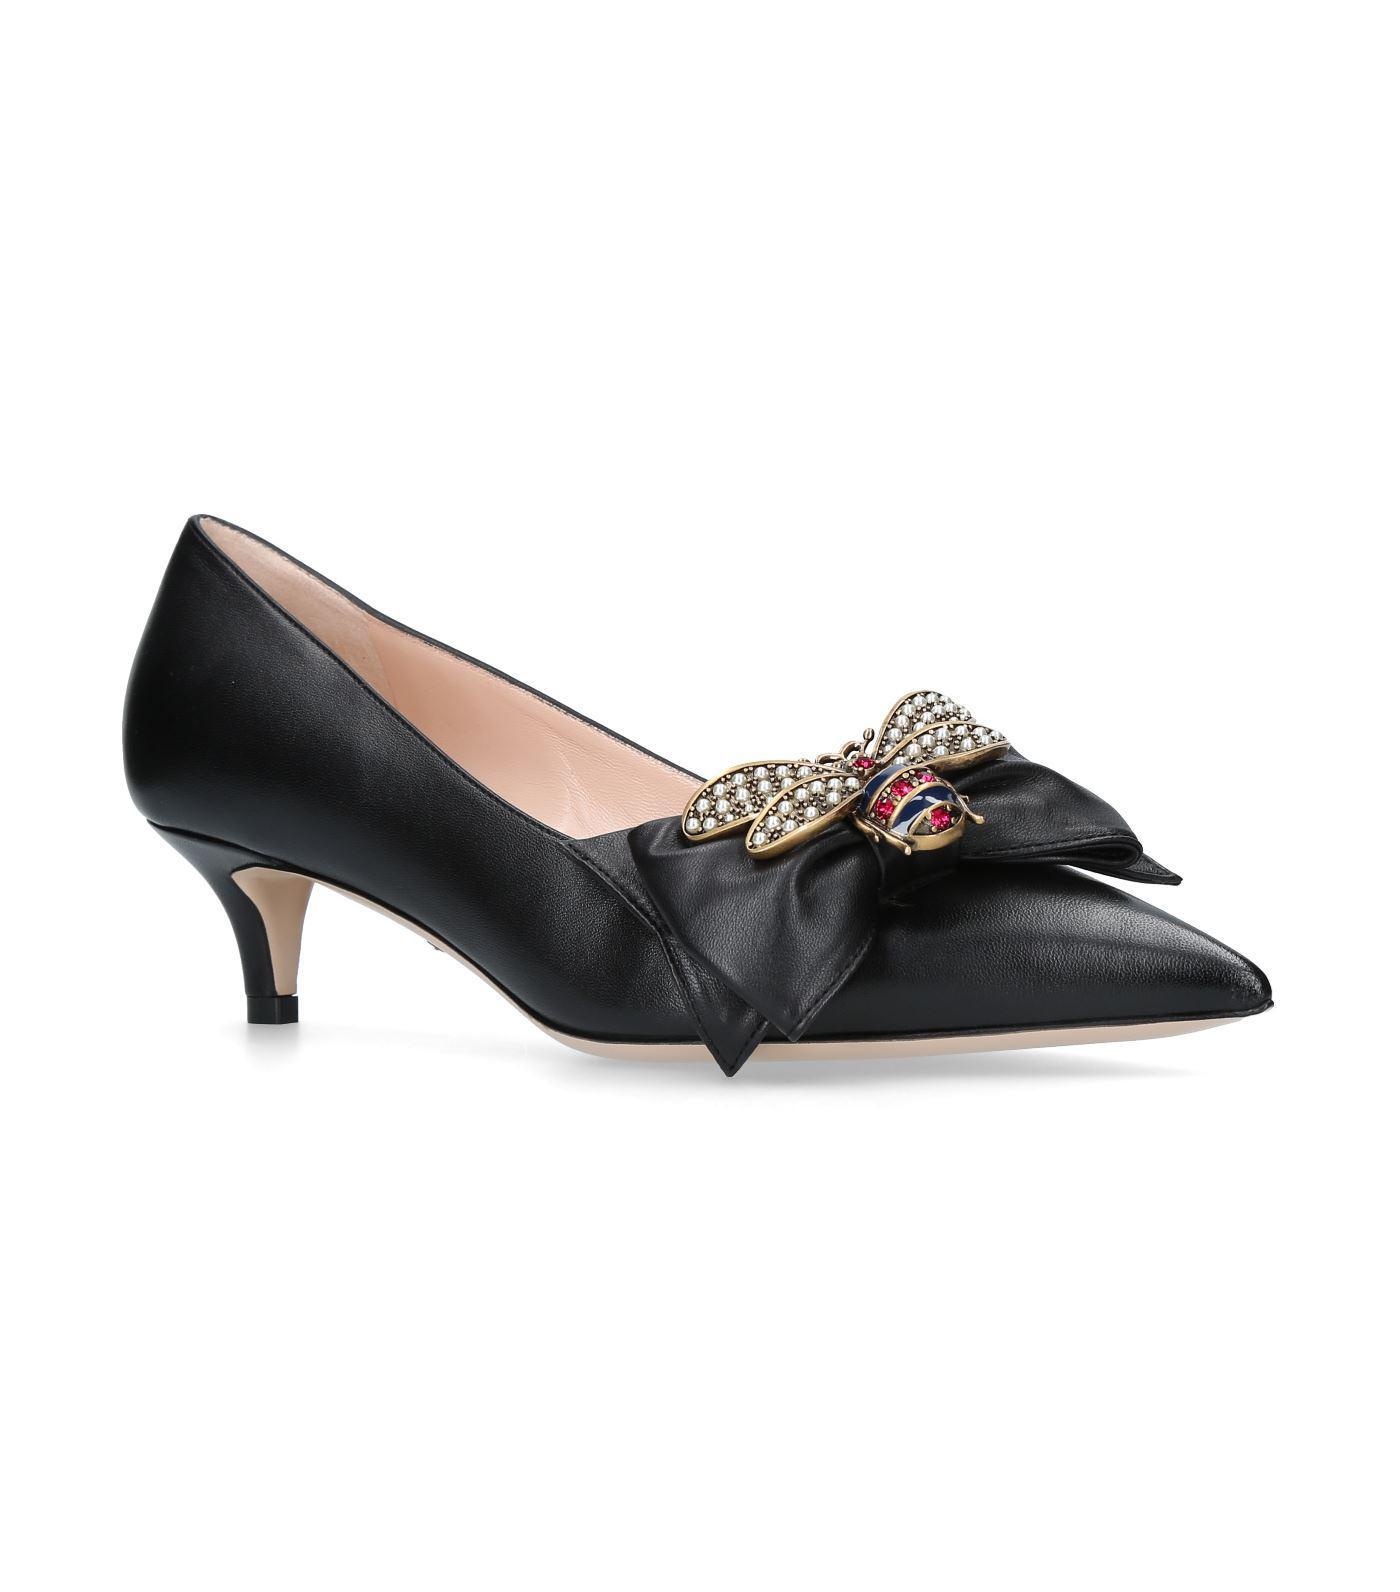 Chaussures Queen Gucci IYsnE52CRh